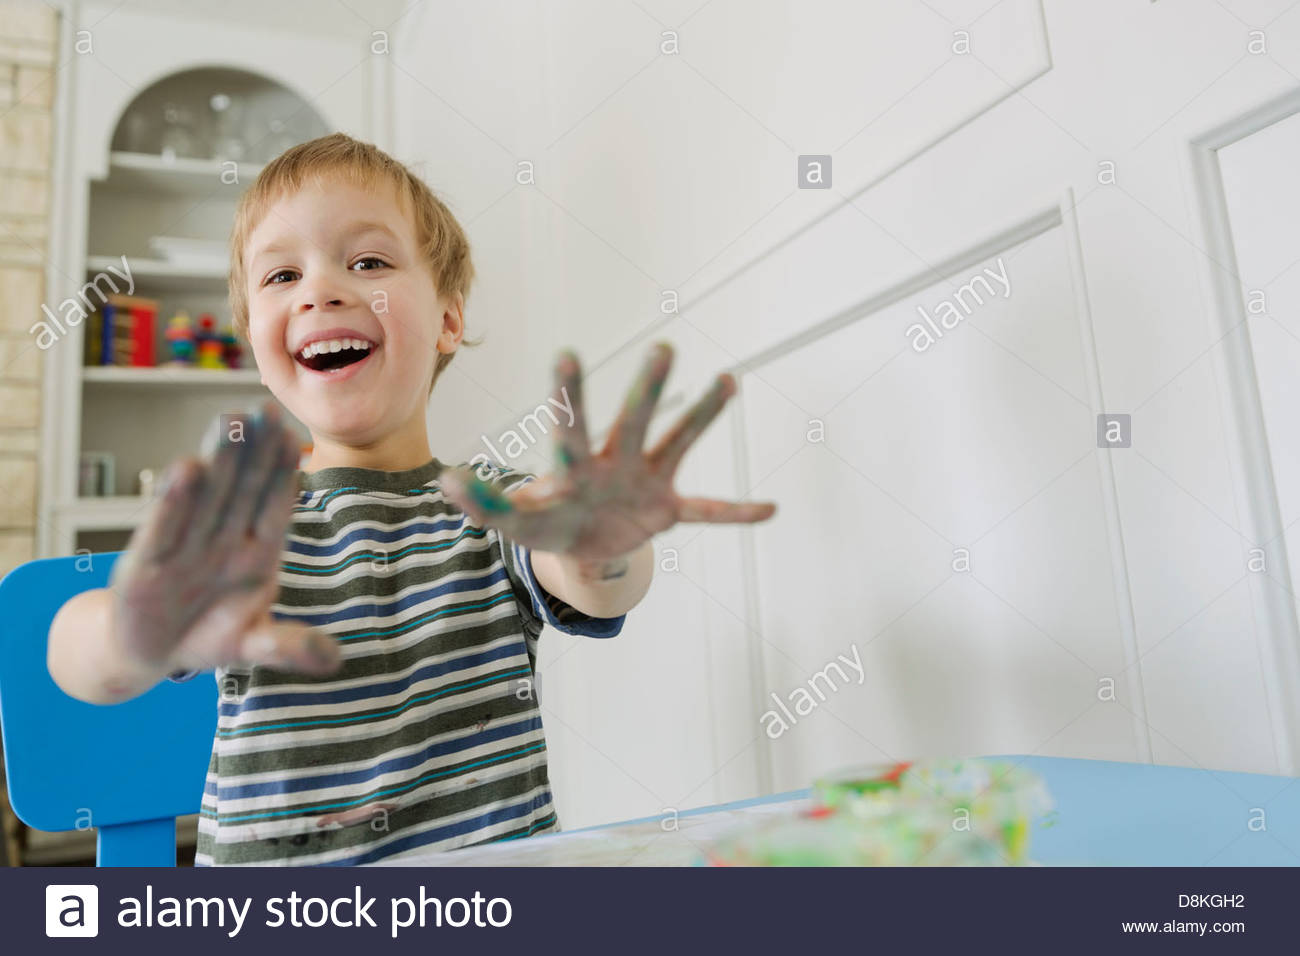 Portrait of boy finger painting - Stock Image